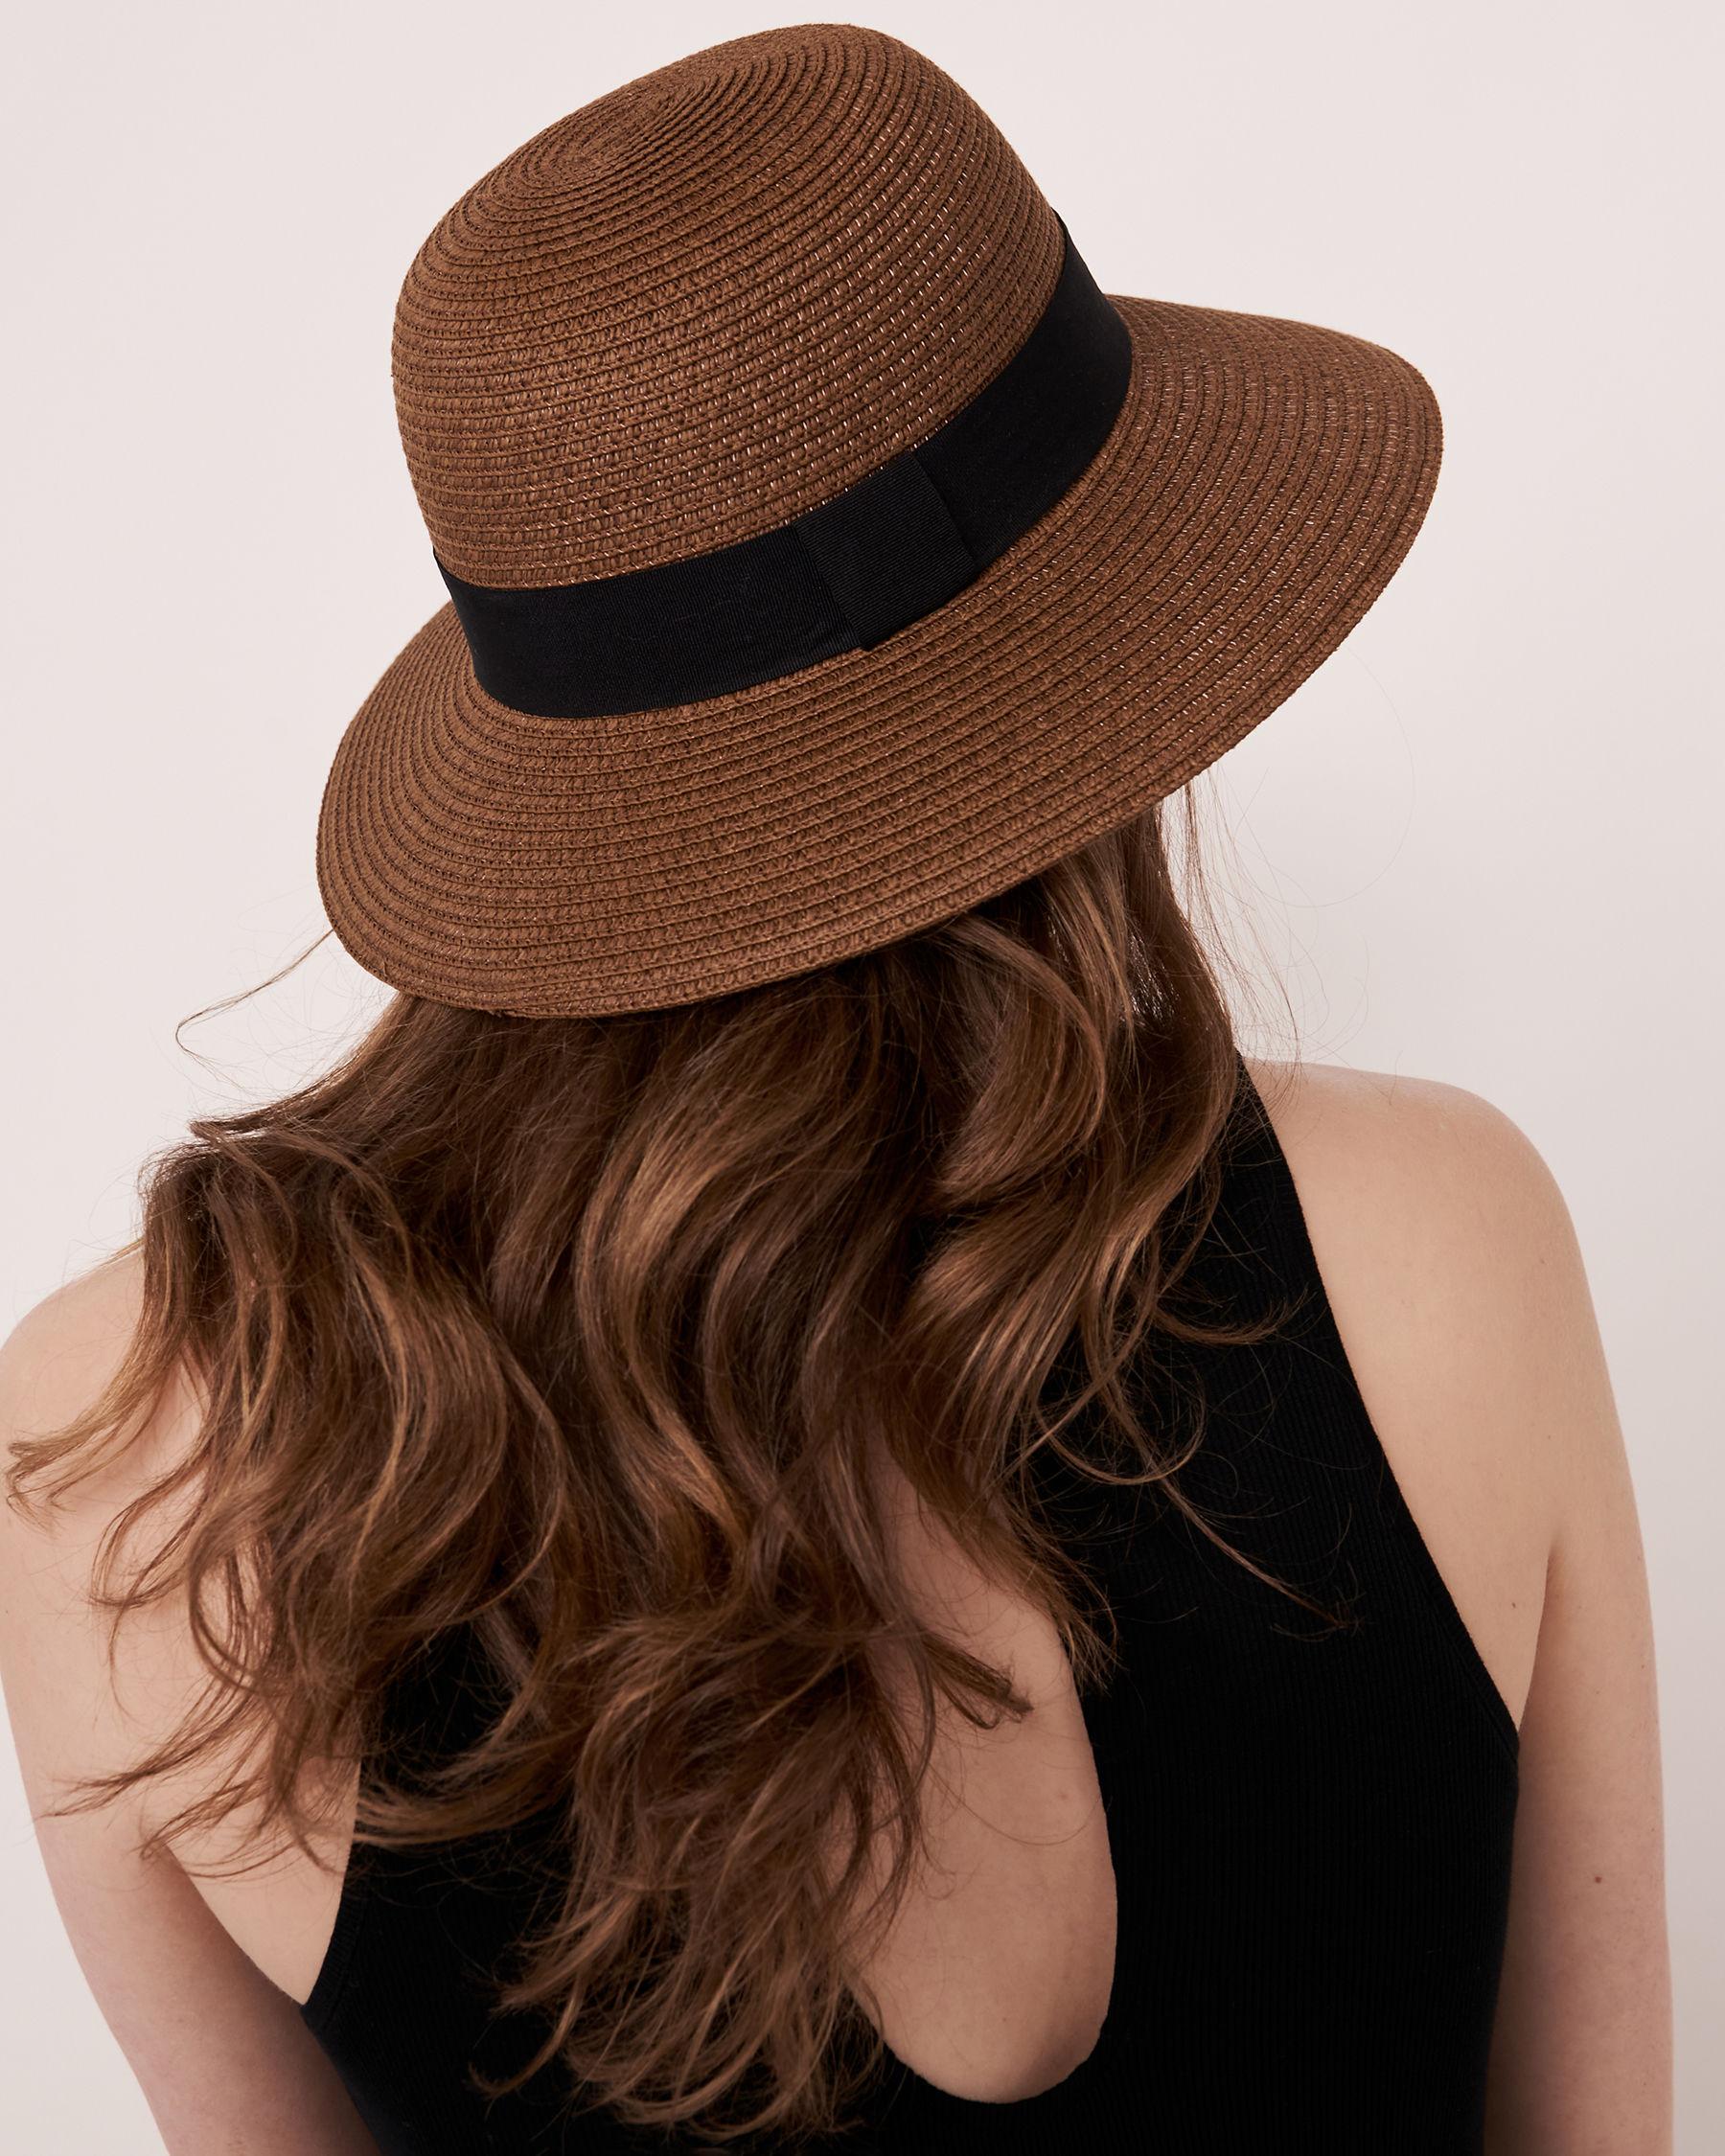 LA VIE EN ROSE AQUA Cloche Hat Dark neutral 80500003 - View2